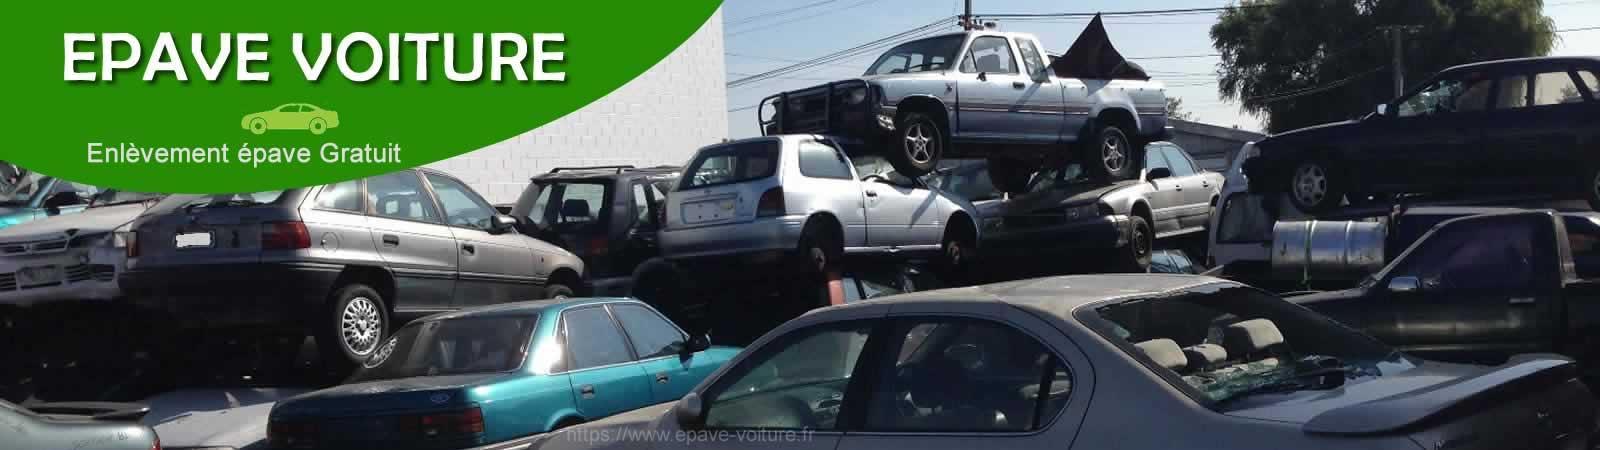 attestation pour amener une voiture a la casse voitures. Black Bedroom Furniture Sets. Home Design Ideas